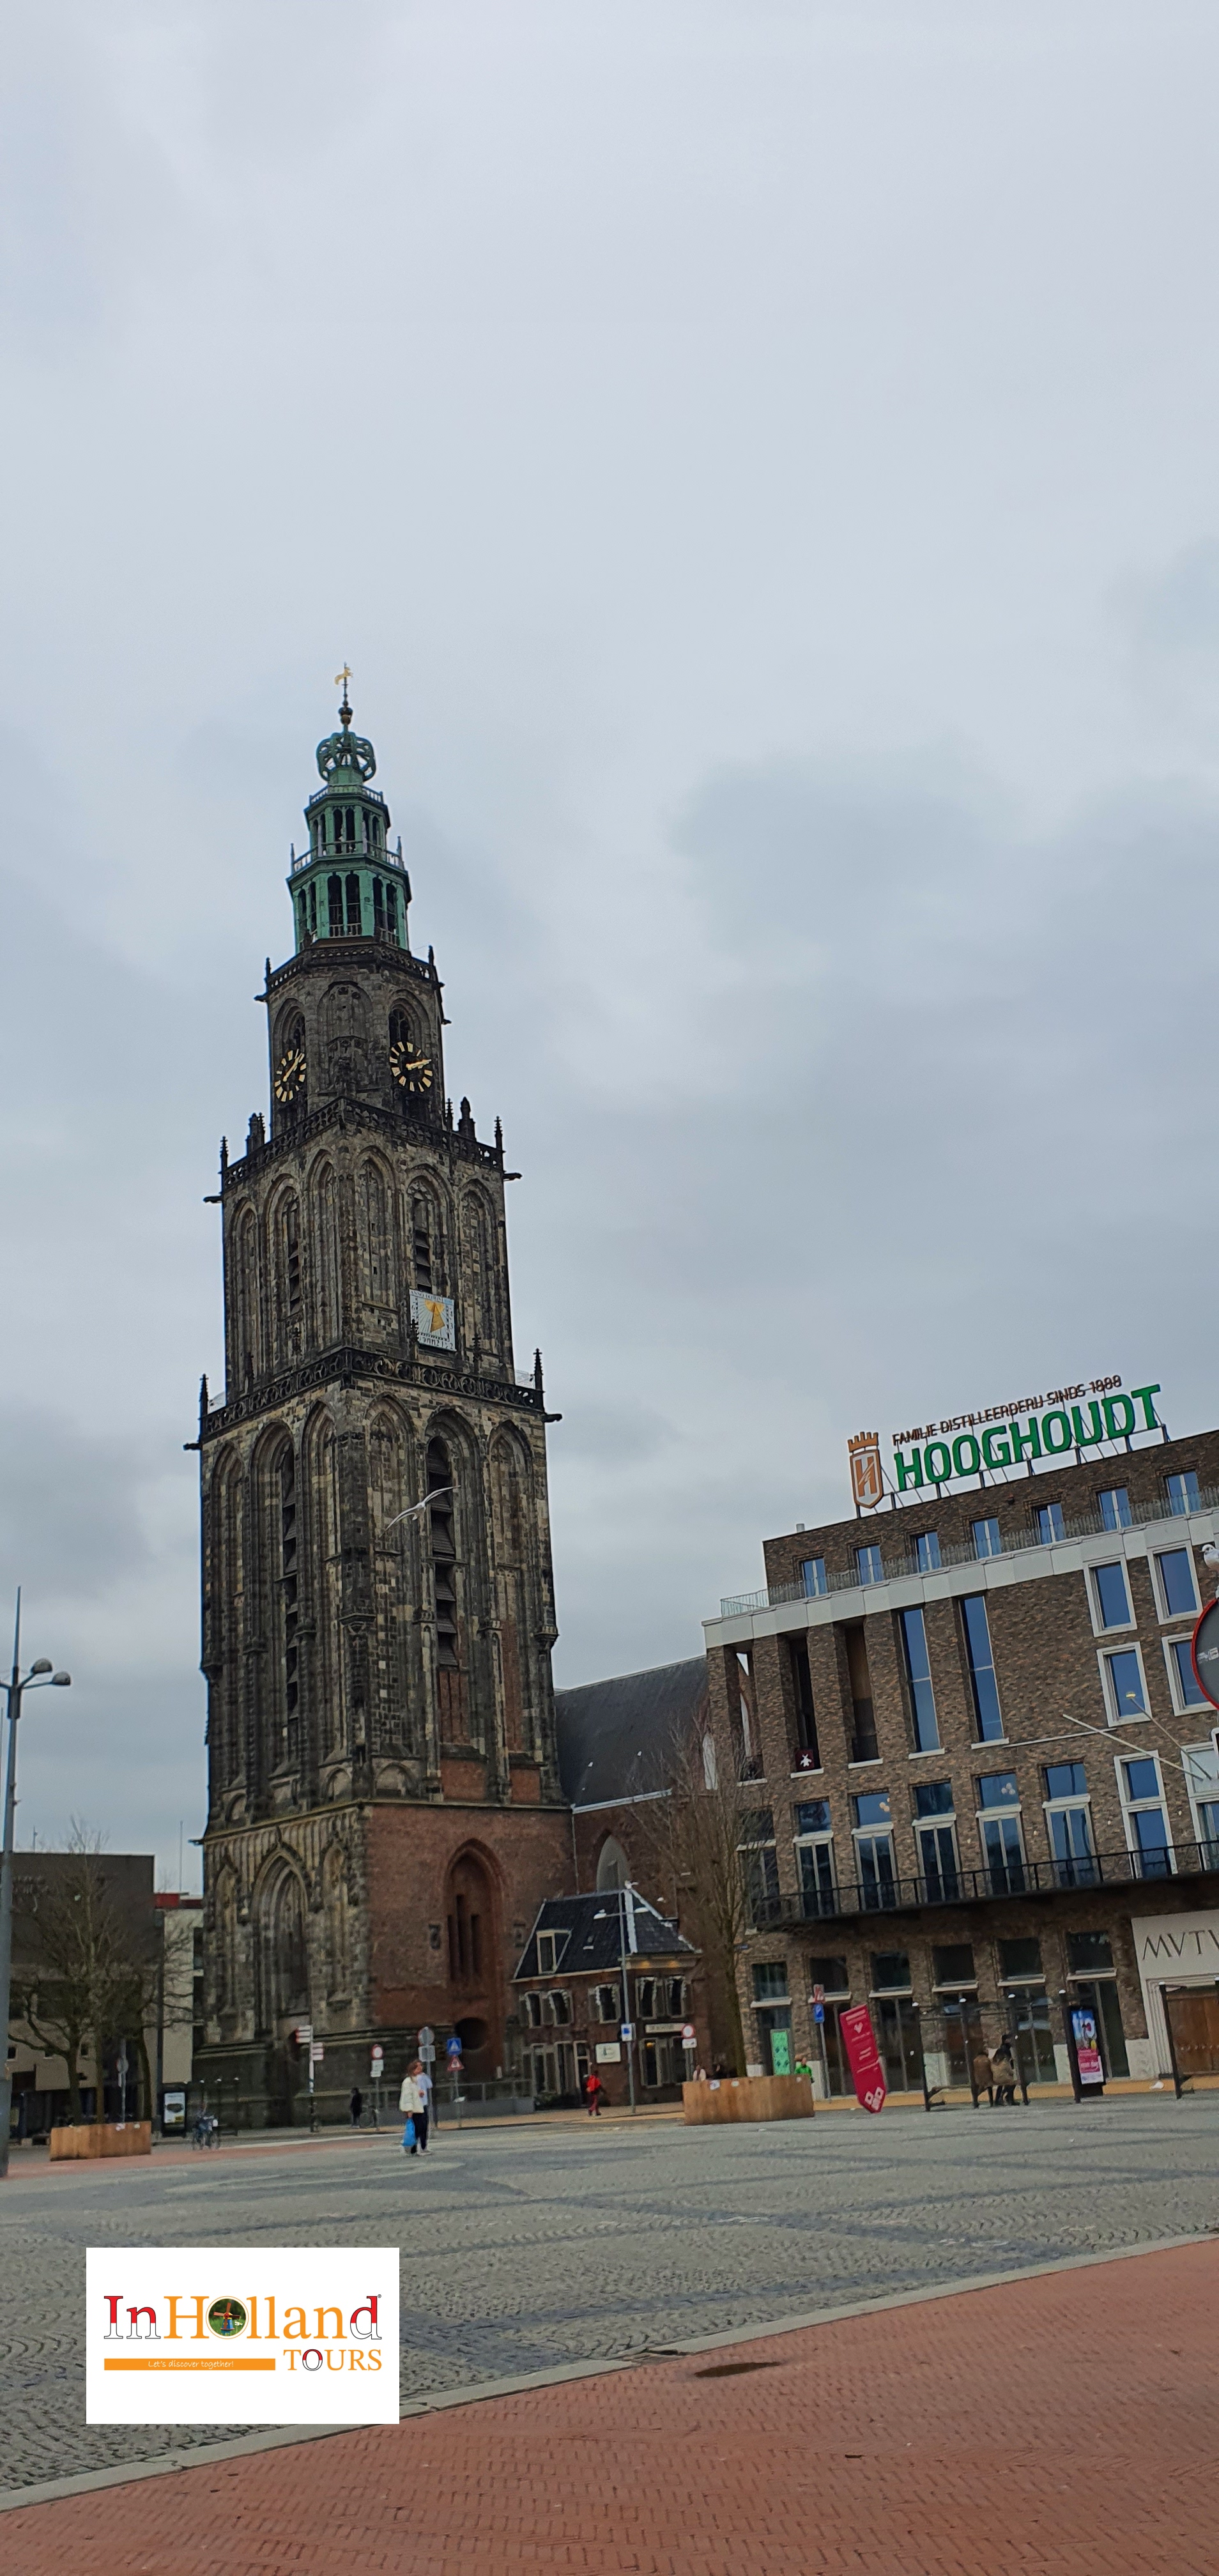 groningen25-belanda-indoholland-tourscom